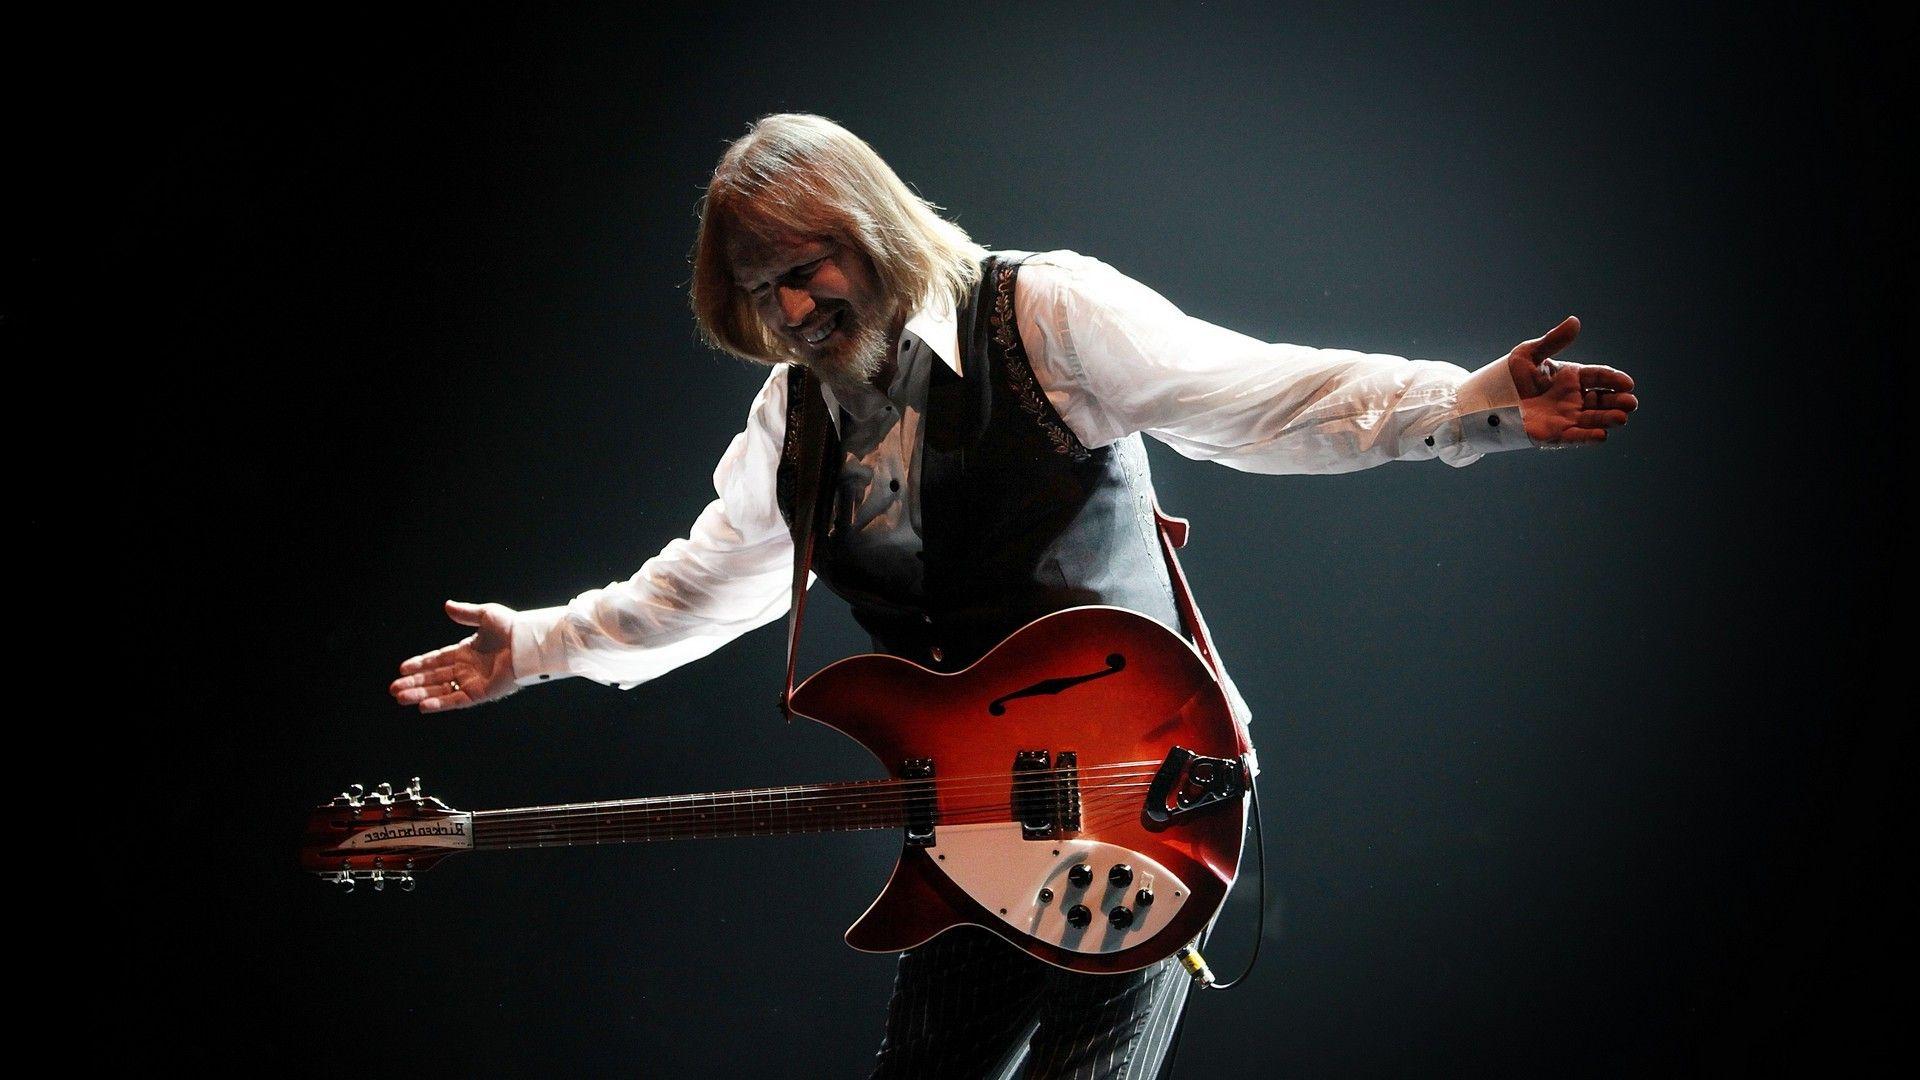 Hd Tom Petty Wallpaper Tom Petty Toms Best Wallpaper Hd